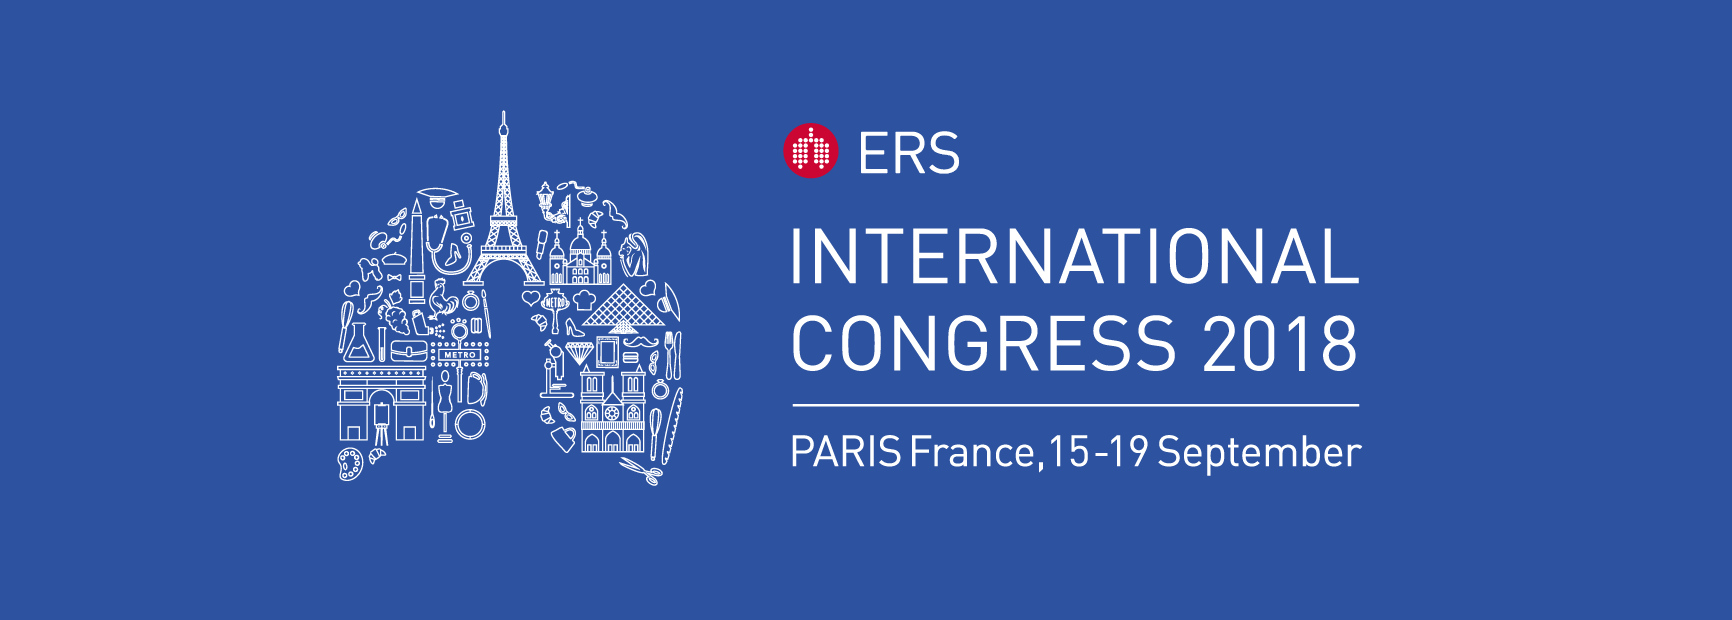 paris-2018-header-image_1732x620-081618.png